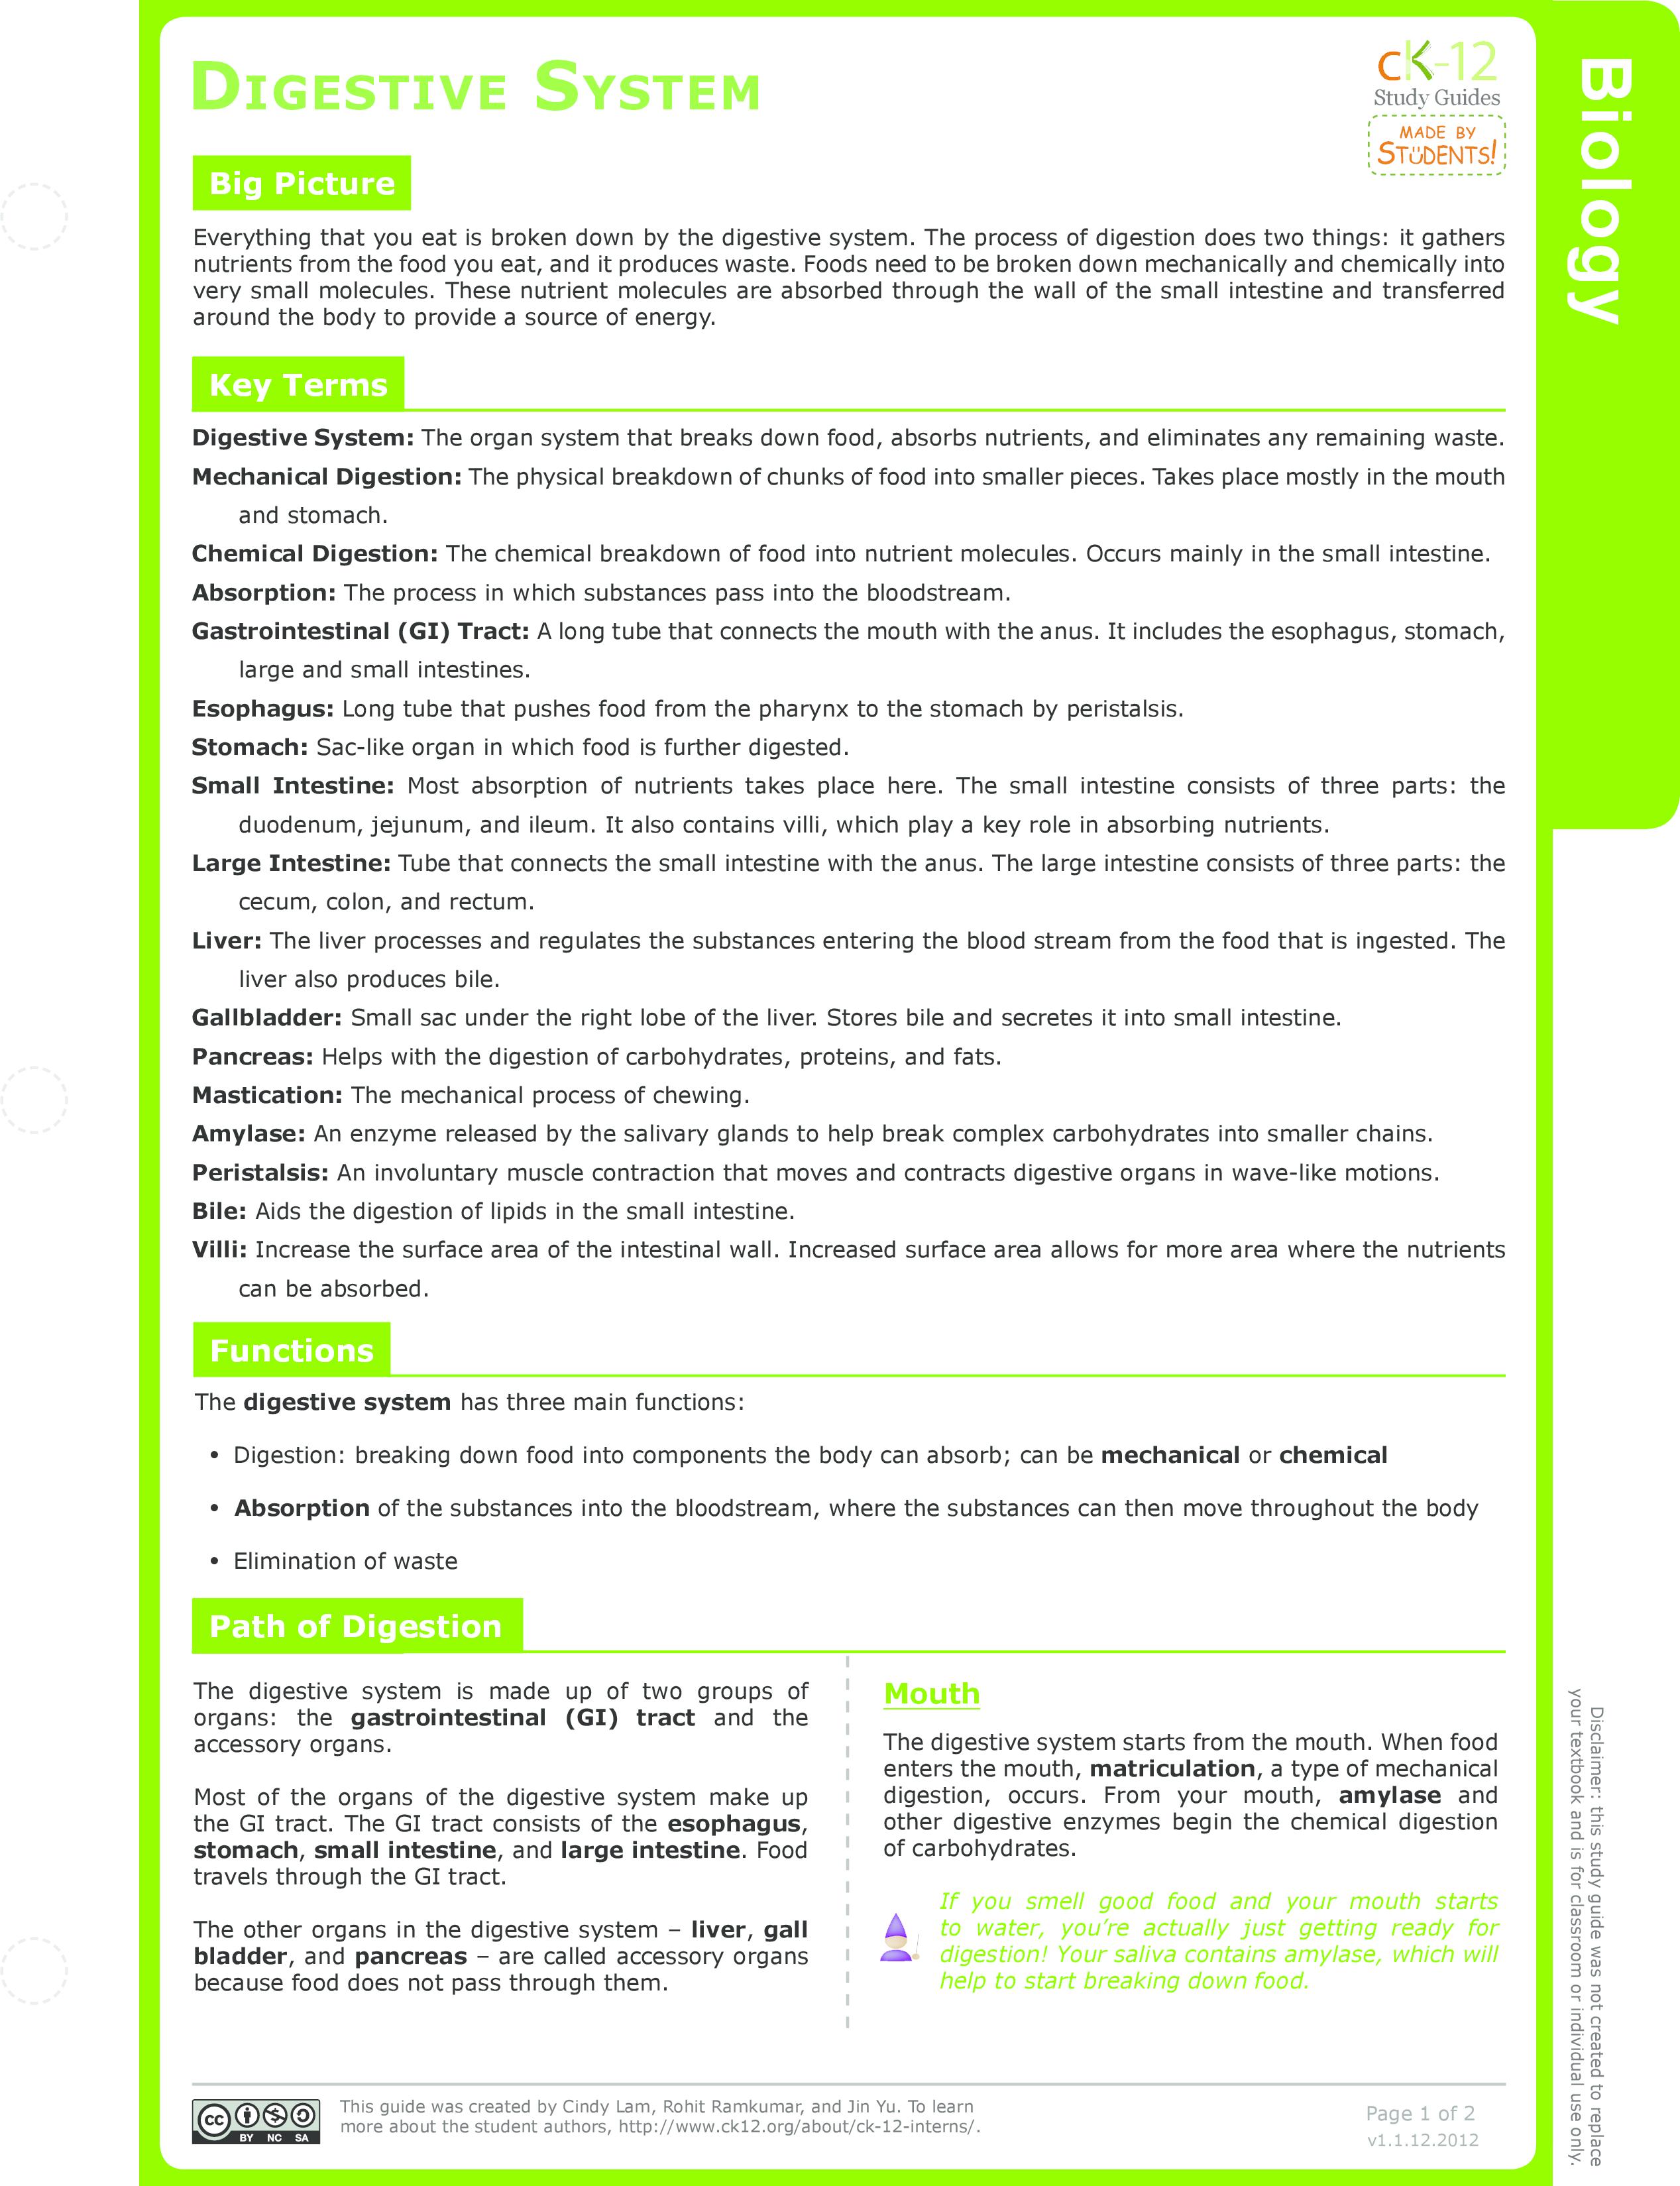 Digestive System Organs Ck 12 Foundation